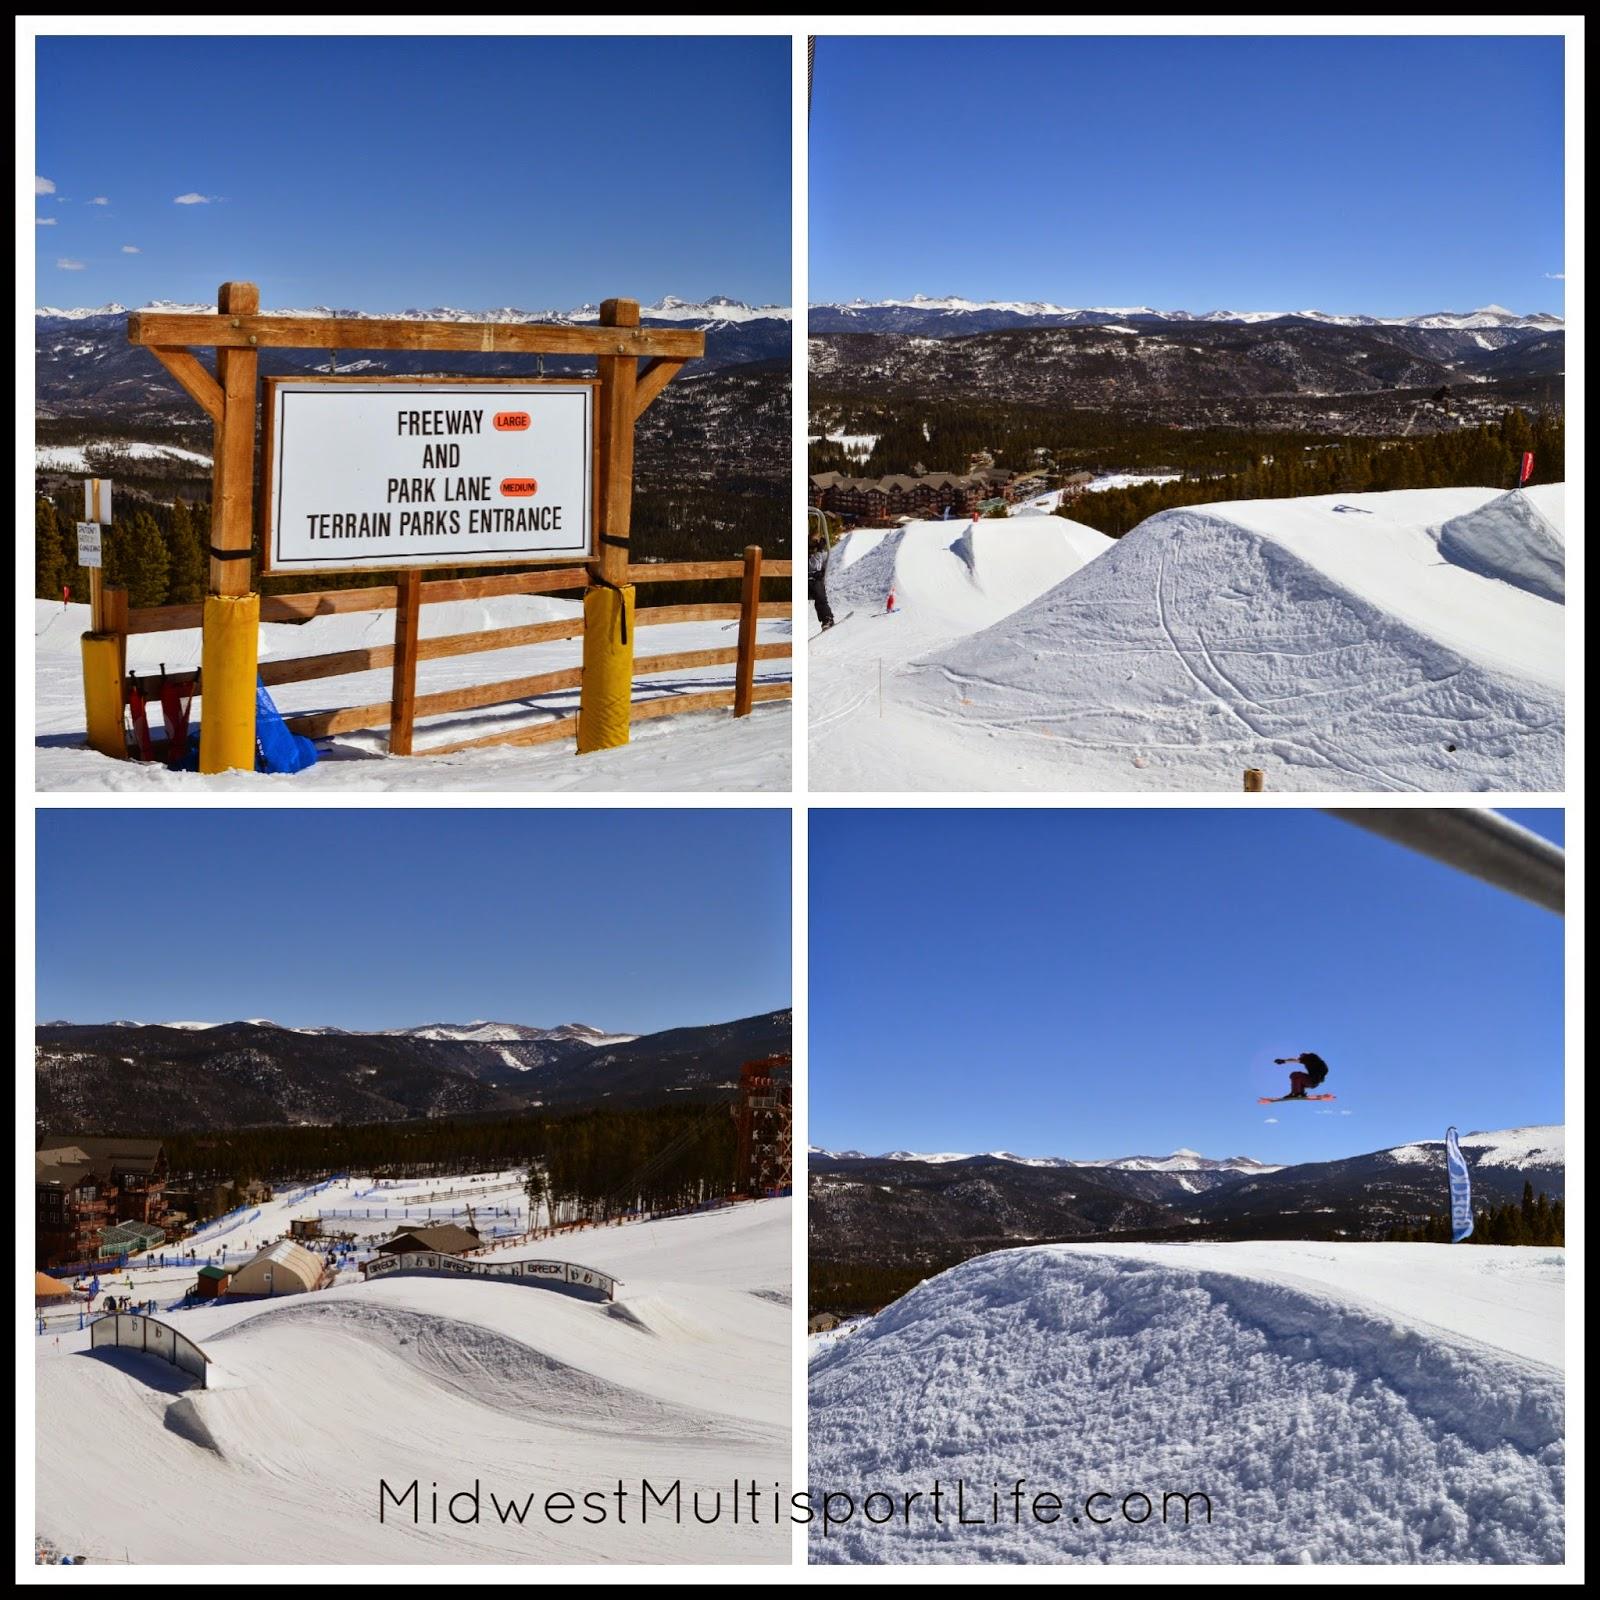 Breckenridge Ski Resort Terrain Parks